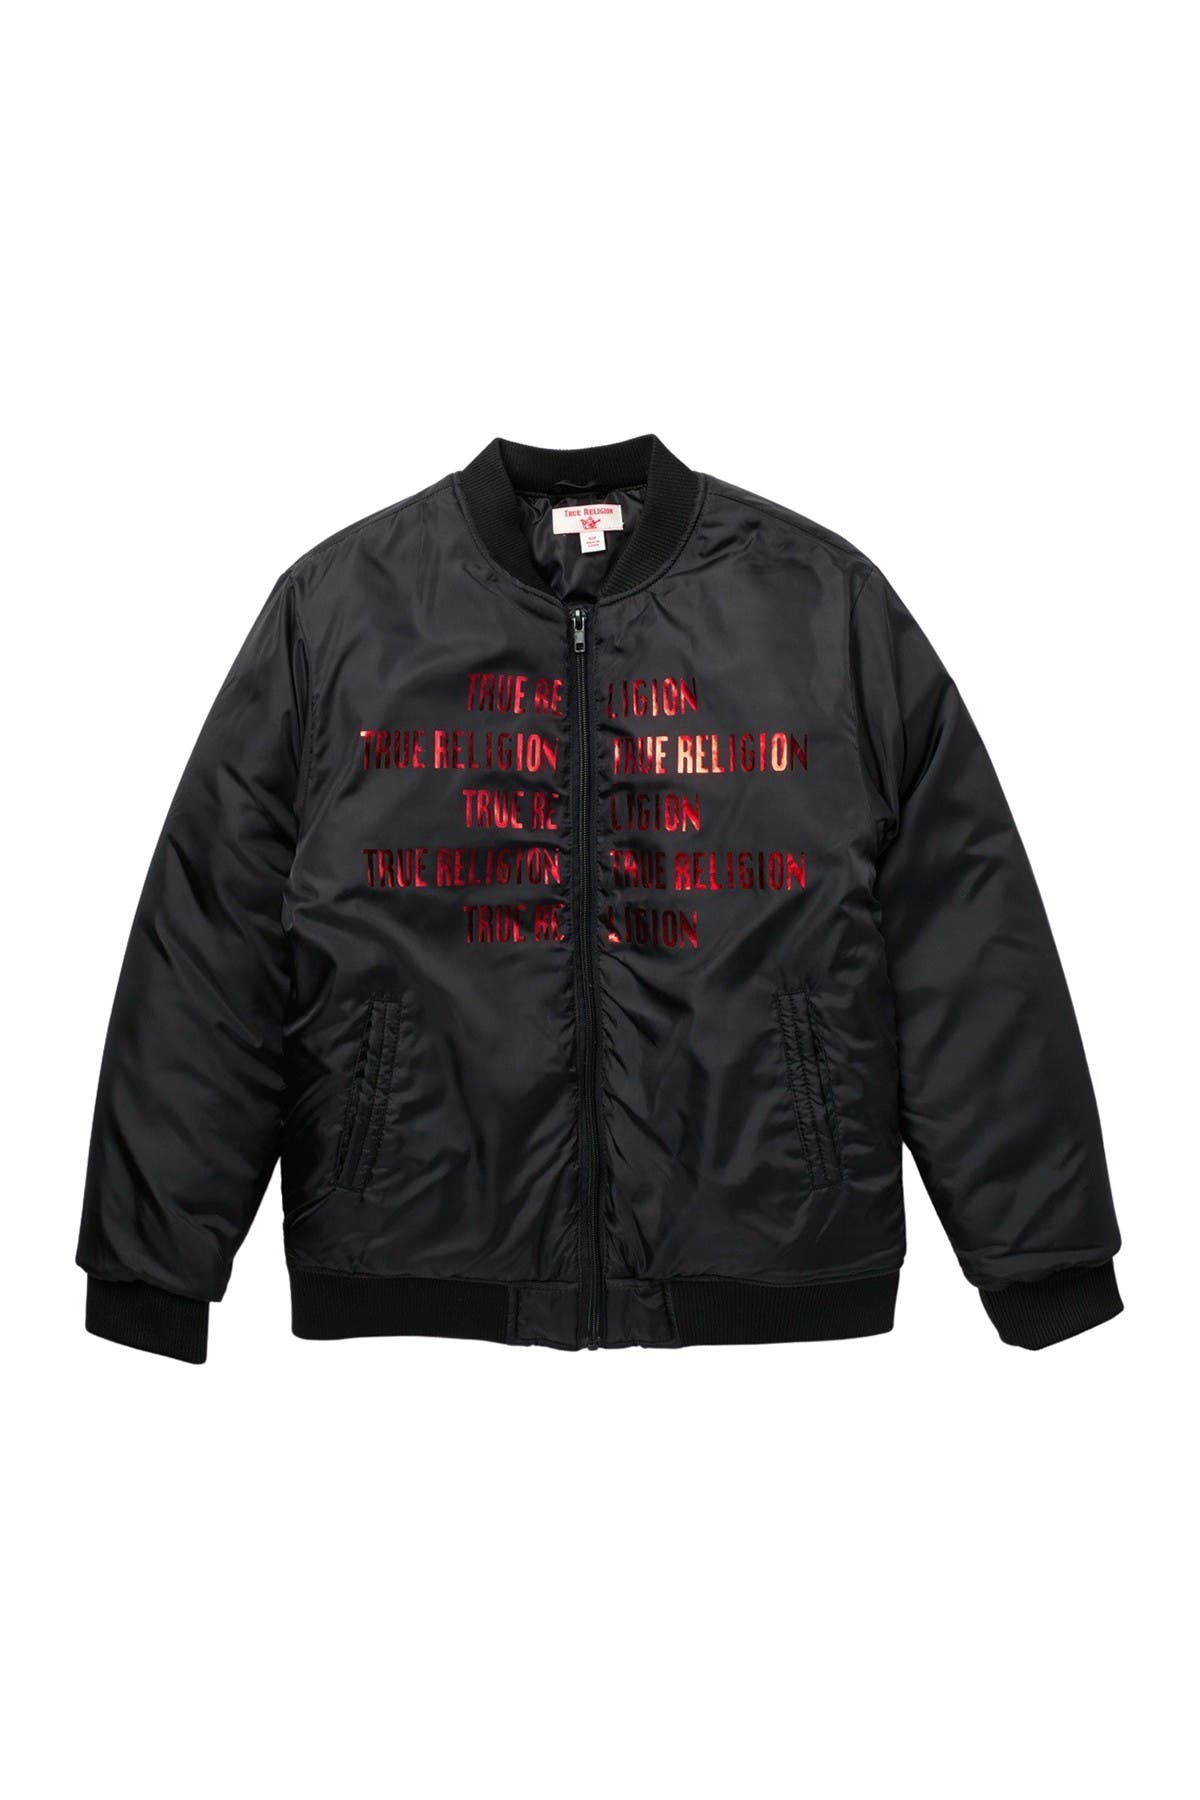 Image of True Religion Heavyweight Bomber Jacket